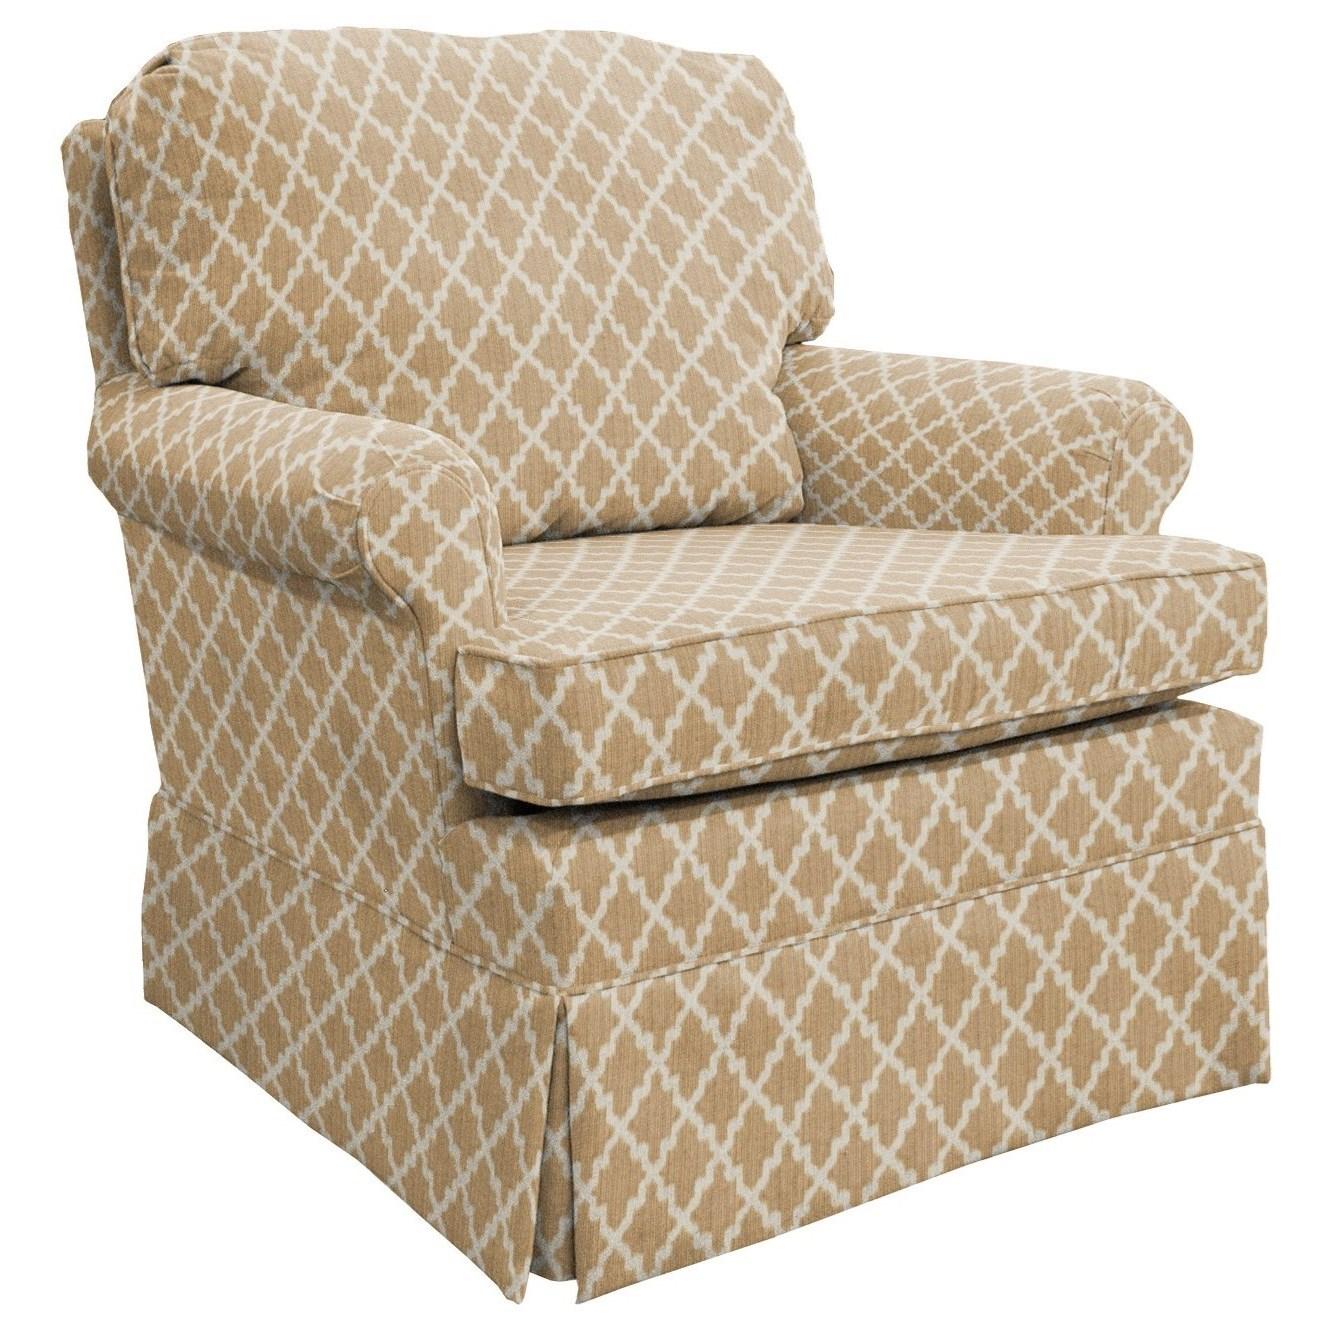 Best Home Furnishings Patoka Glider Club Chair - Item Number: 2616-28849